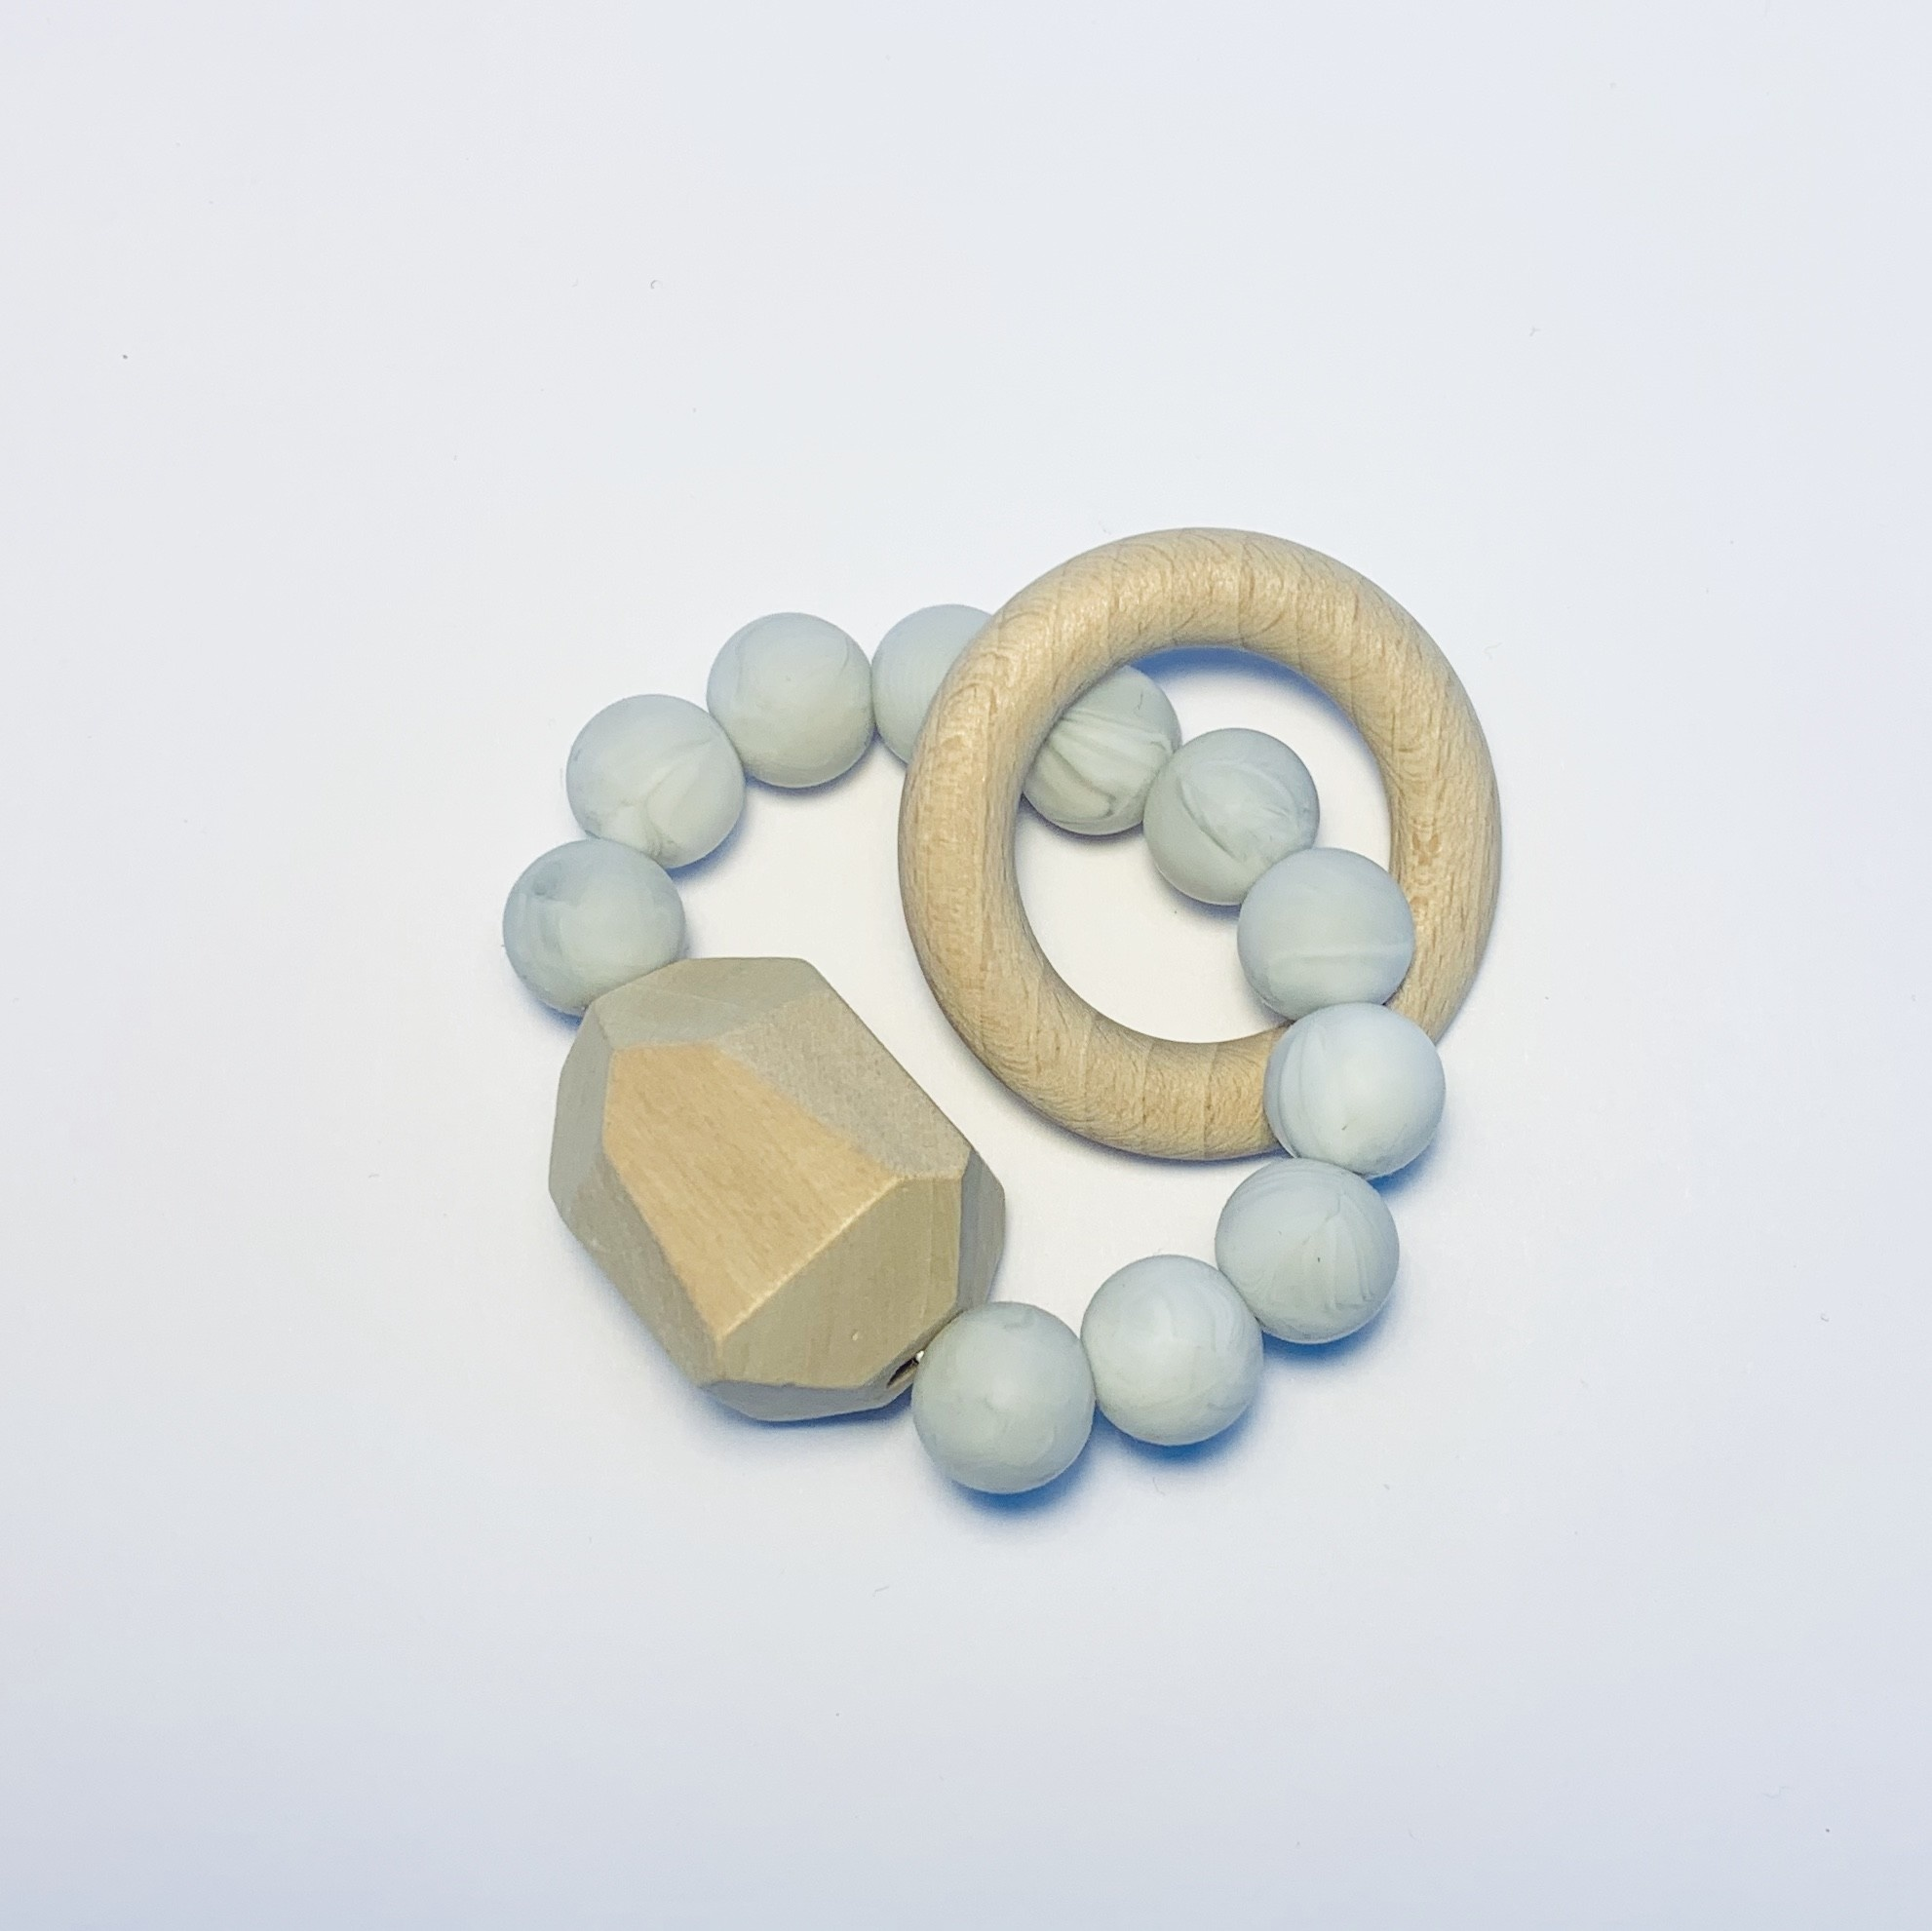 Sugar + Maple Silicone + Beechwood Teether Gem Marble